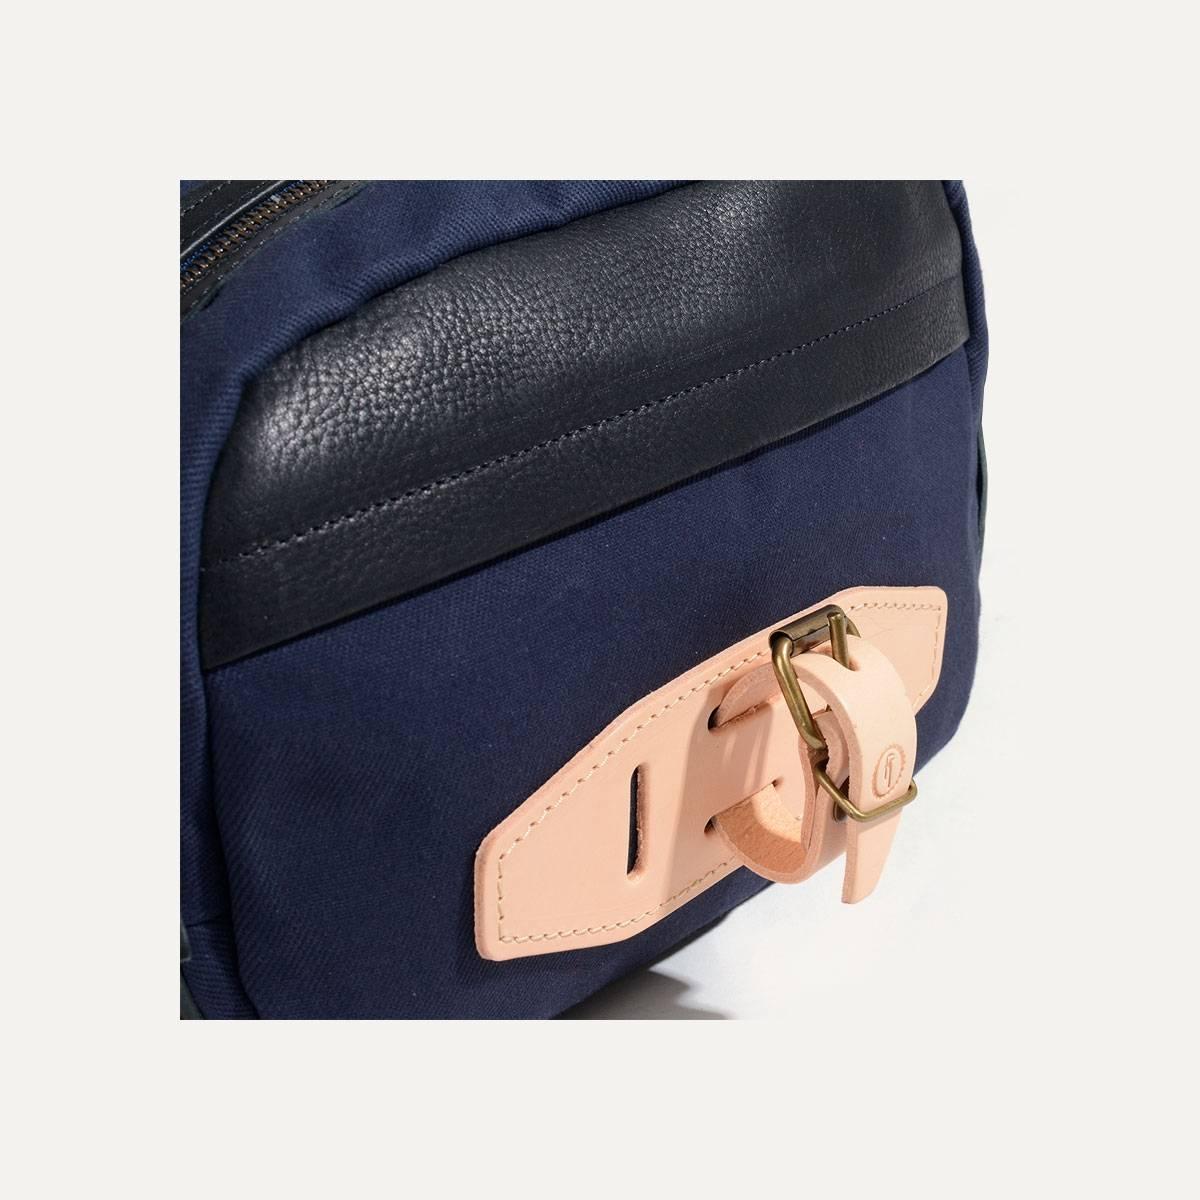 Honshu Belt bag - Navy / Black (image n°6)